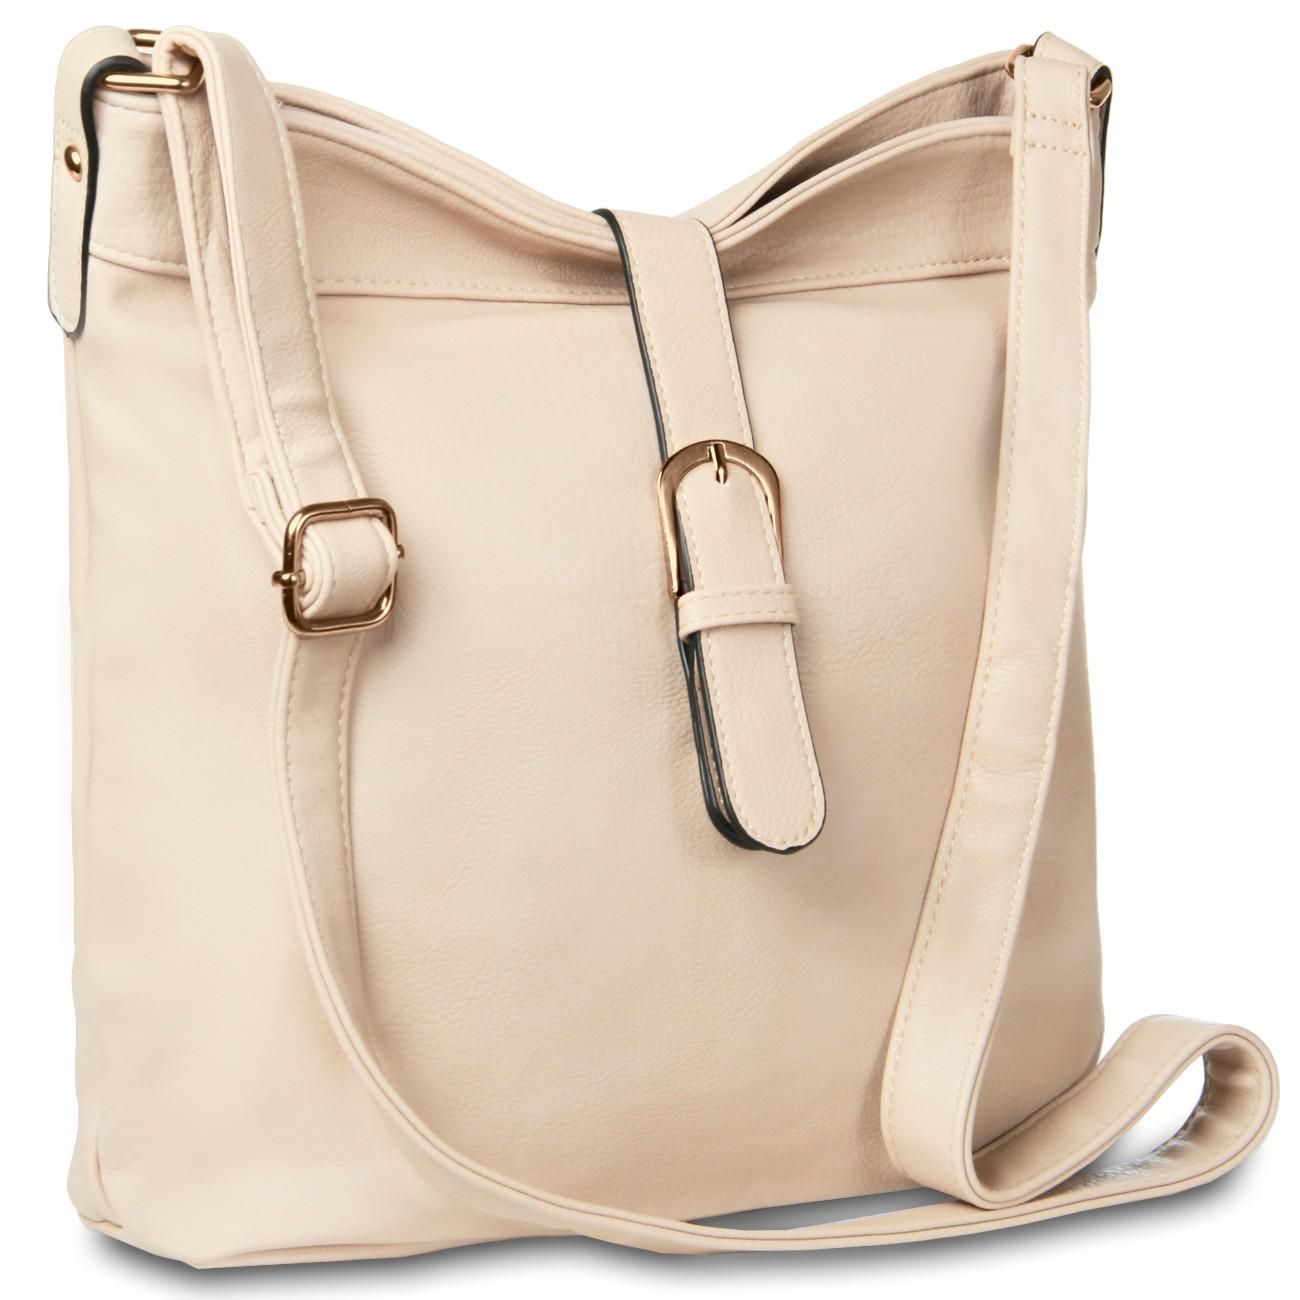 caspar damen sportlich elegante umh ngetasche handtasche. Black Bedroom Furniture Sets. Home Design Ideas